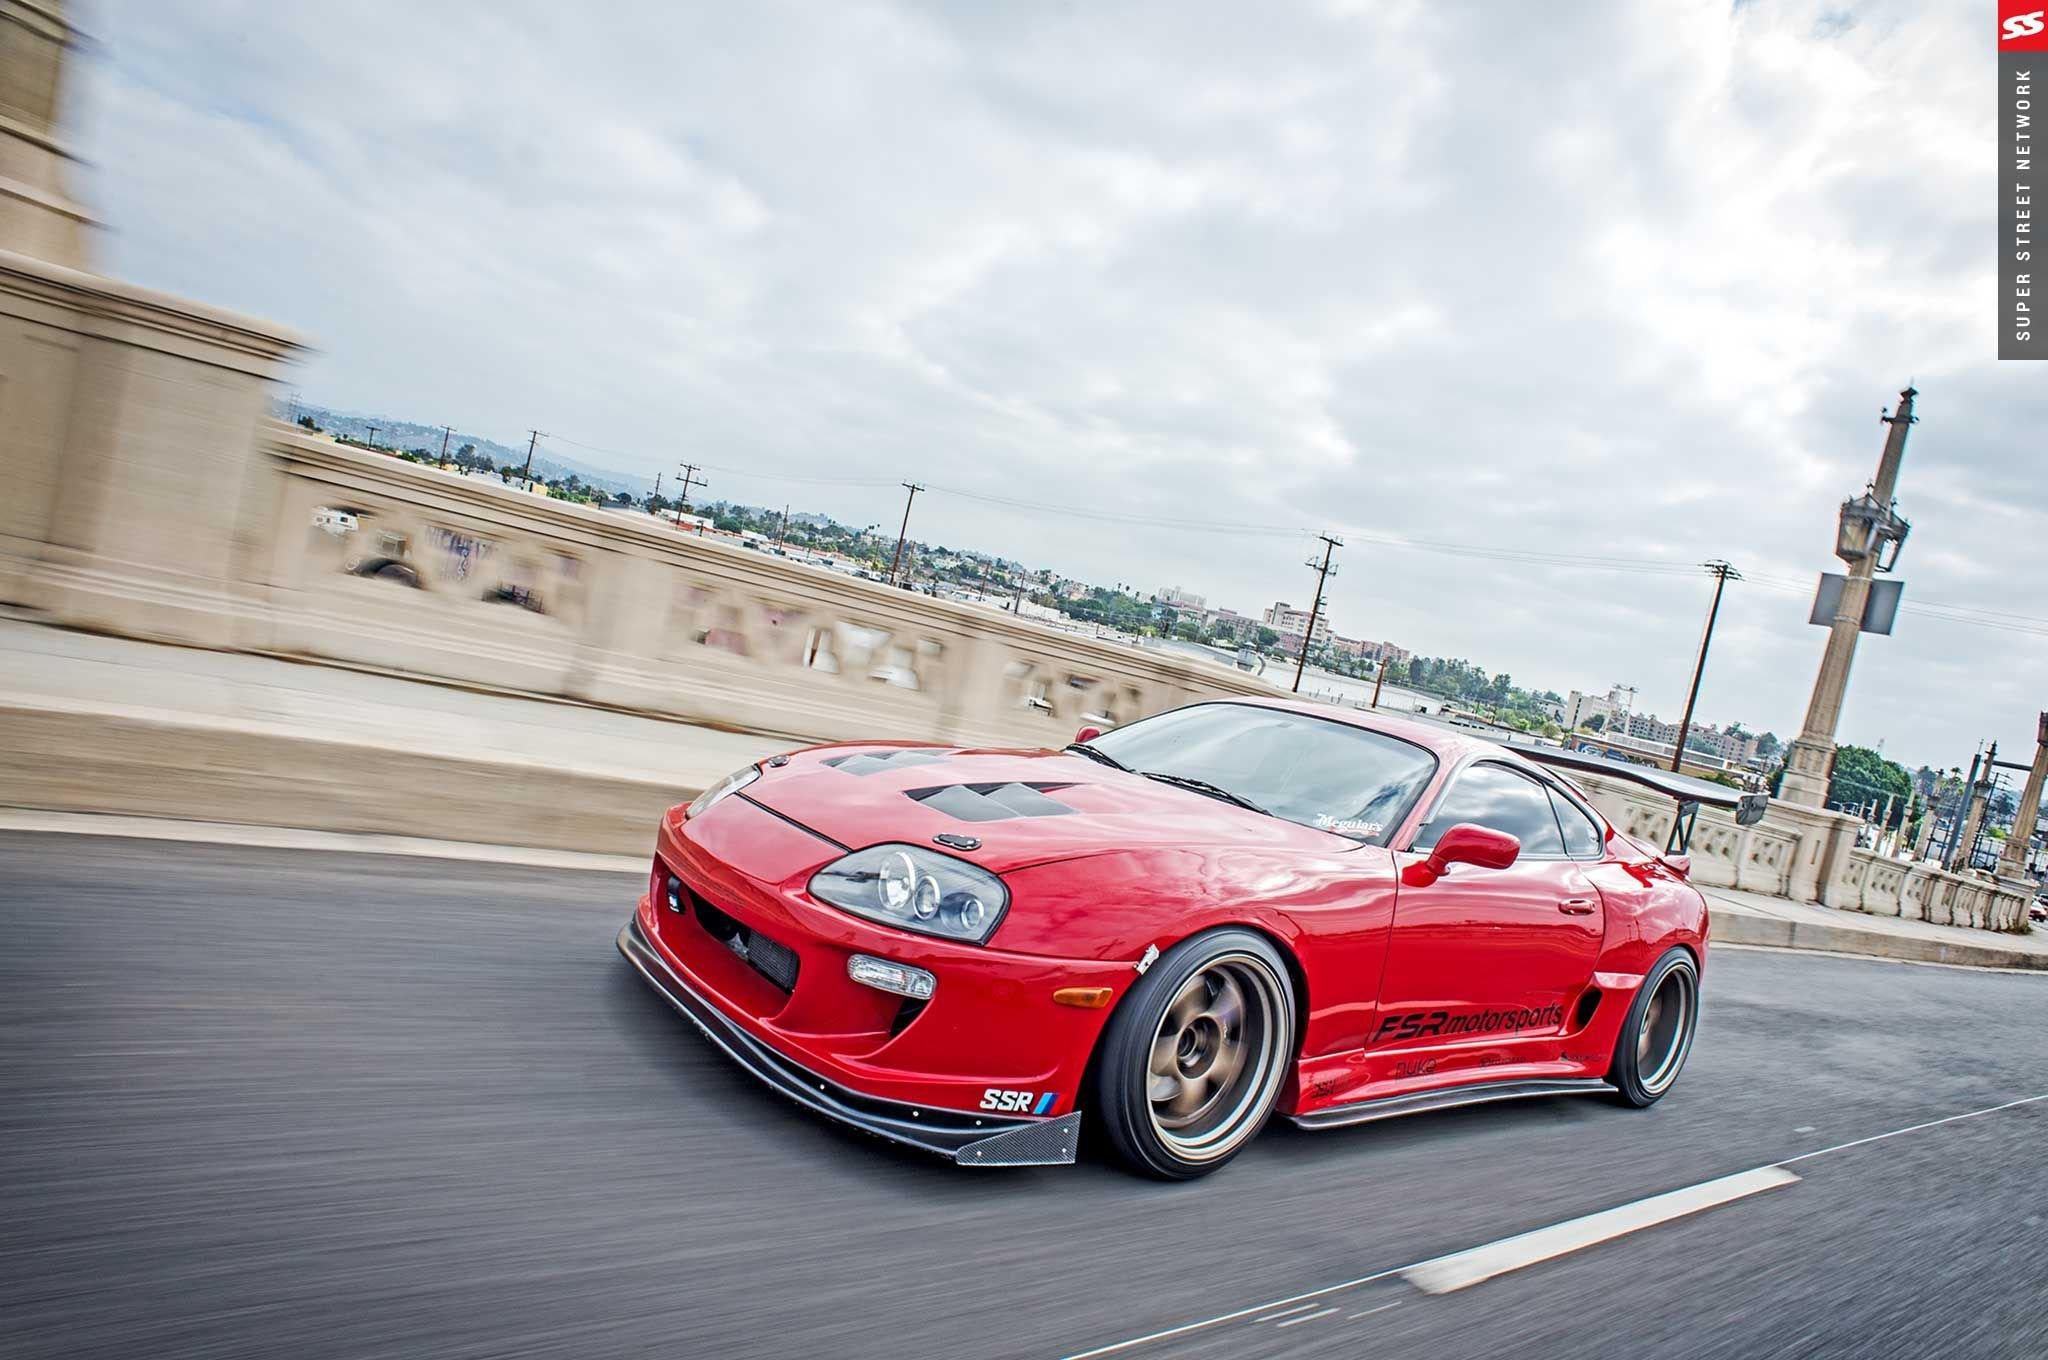 1995 Toyota Supra Red Modified Cars Wallpaper 2048x1360